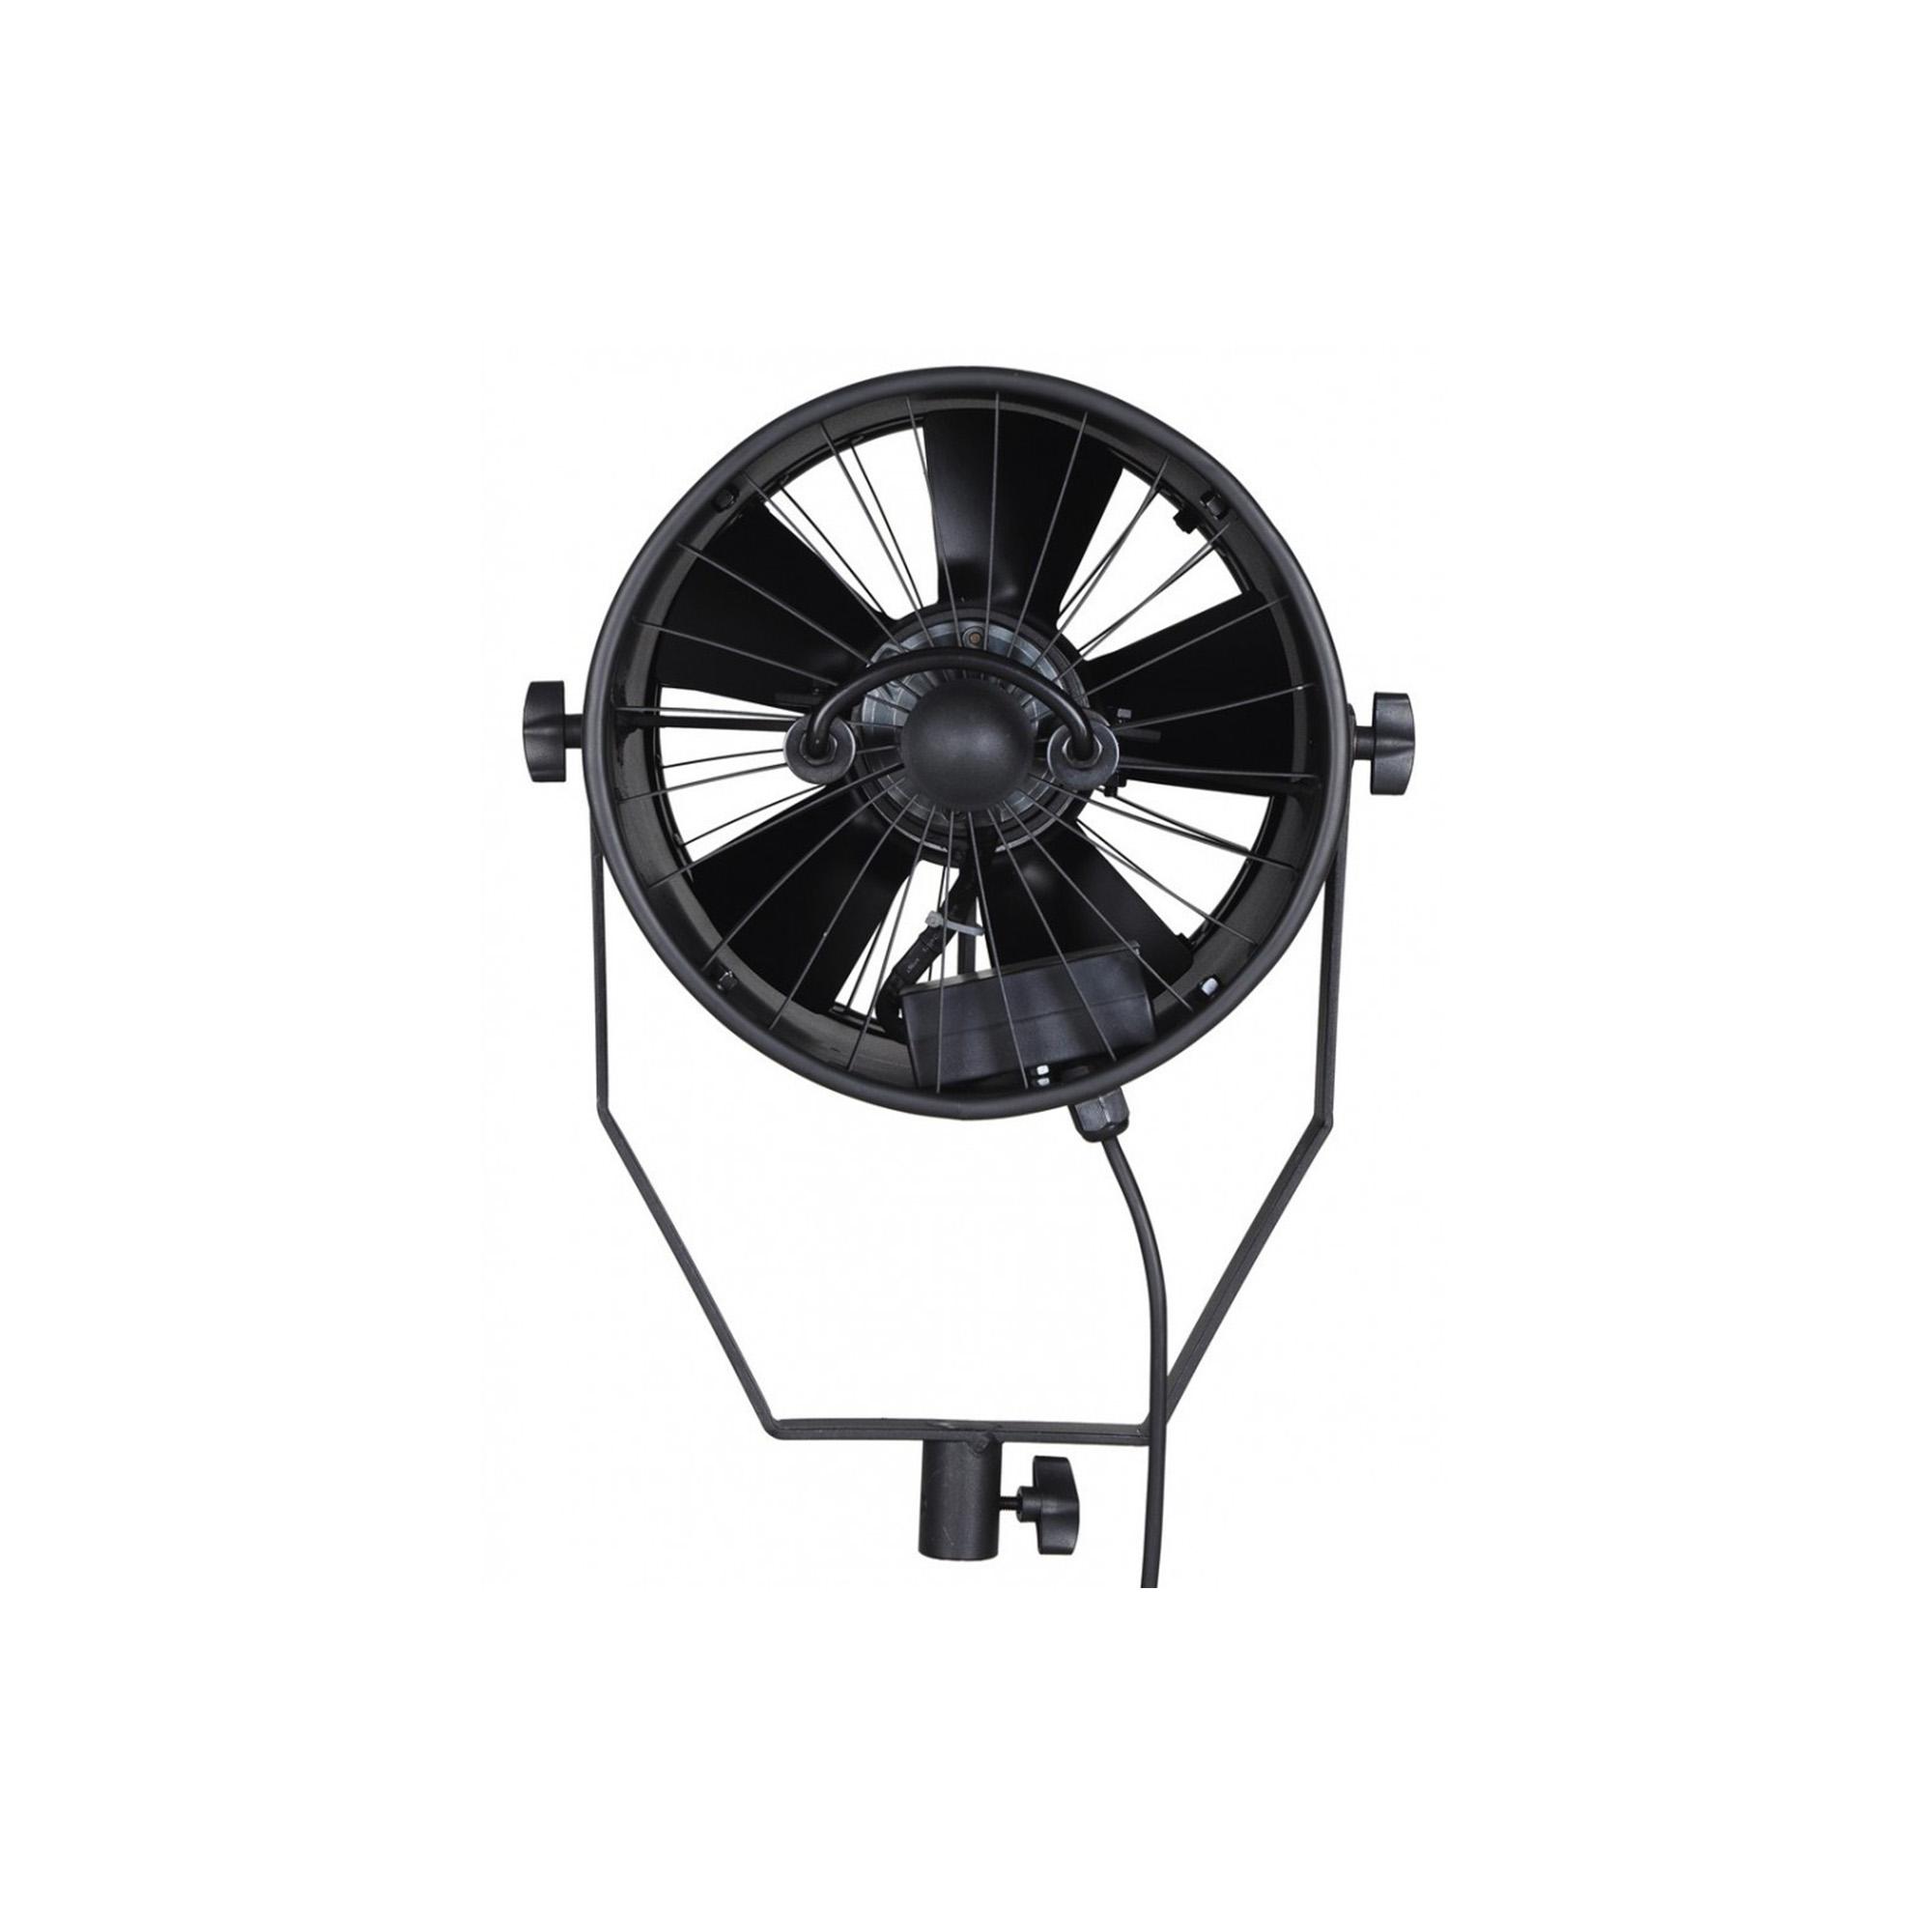 Bowens Wind Machine available to rent / verhuur / location at 50.8 Studio • Avenger, Belgïe, Belgique, Belgium, Grip, Huur, Location, Louer, Only in, Photo, Rent, Rental, Stand, Steamer, Studio, Verhuur, Video